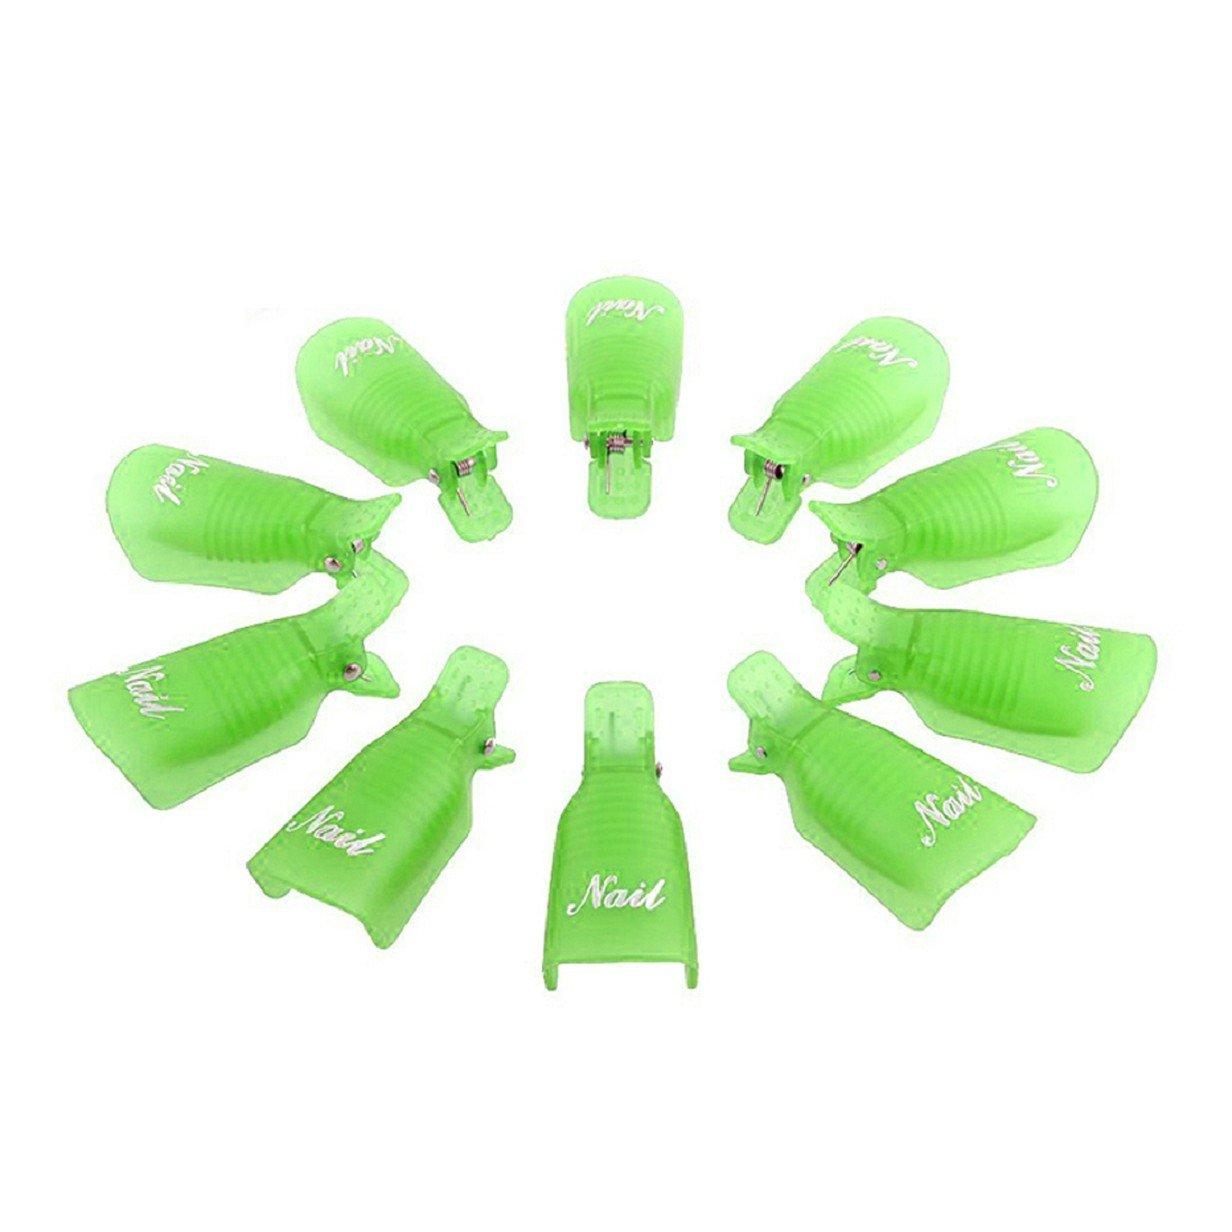 ABC® 10PC Plastic Nail Art Soak Off Cap Clip UV Gel Polish Remover Wrap Tool (Green) ABC®-1234